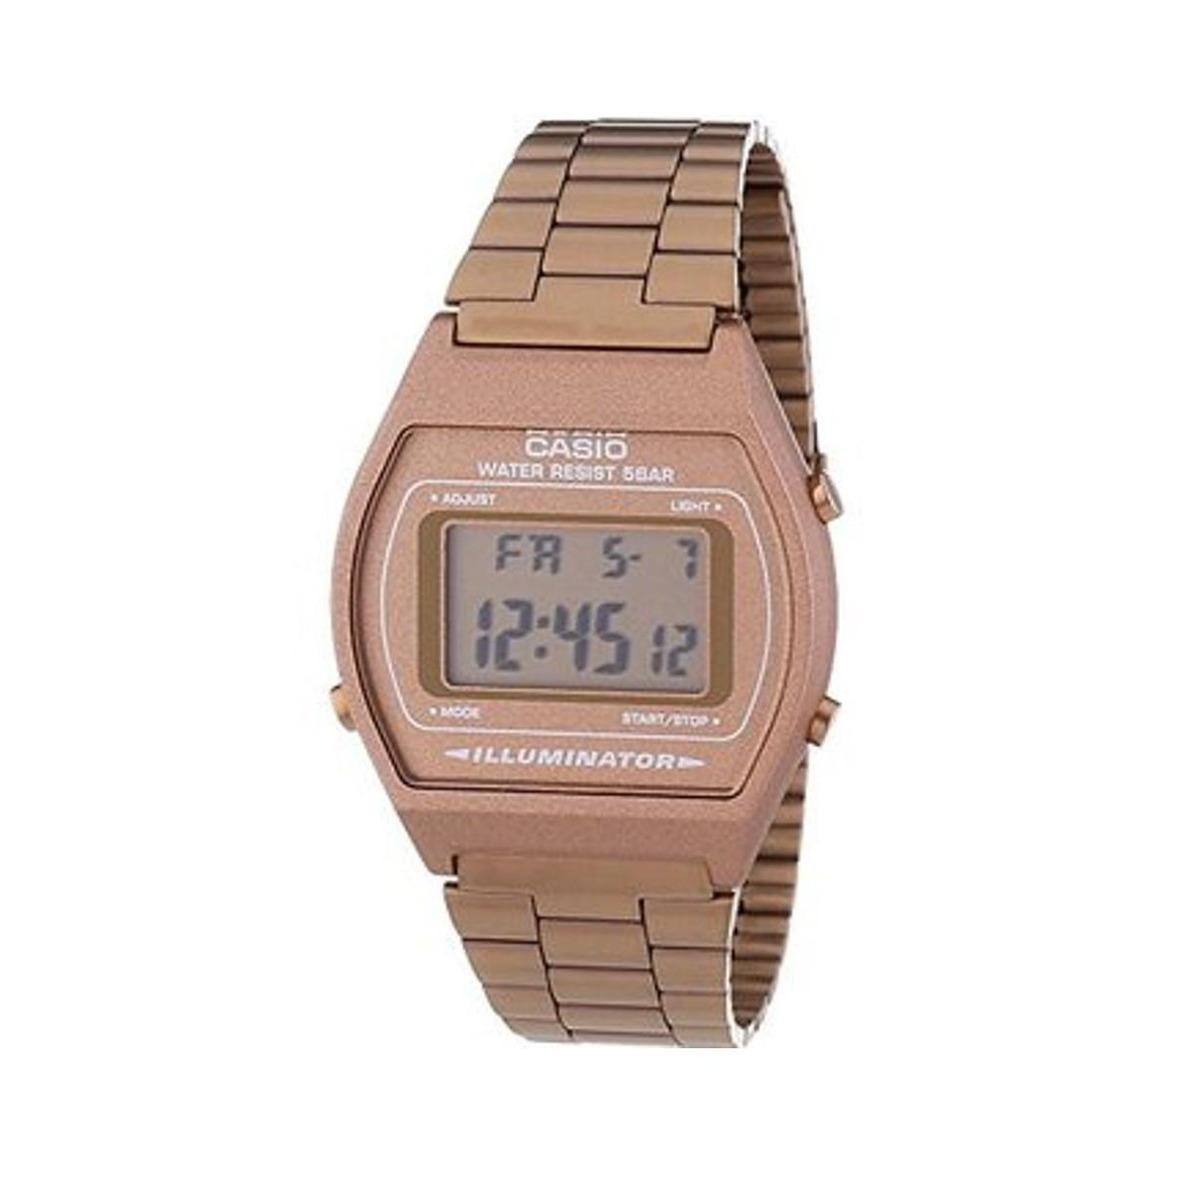 604402b33fc2 para caballero reloj casio vintage b640 caballero acero ino. Cargando zoom.